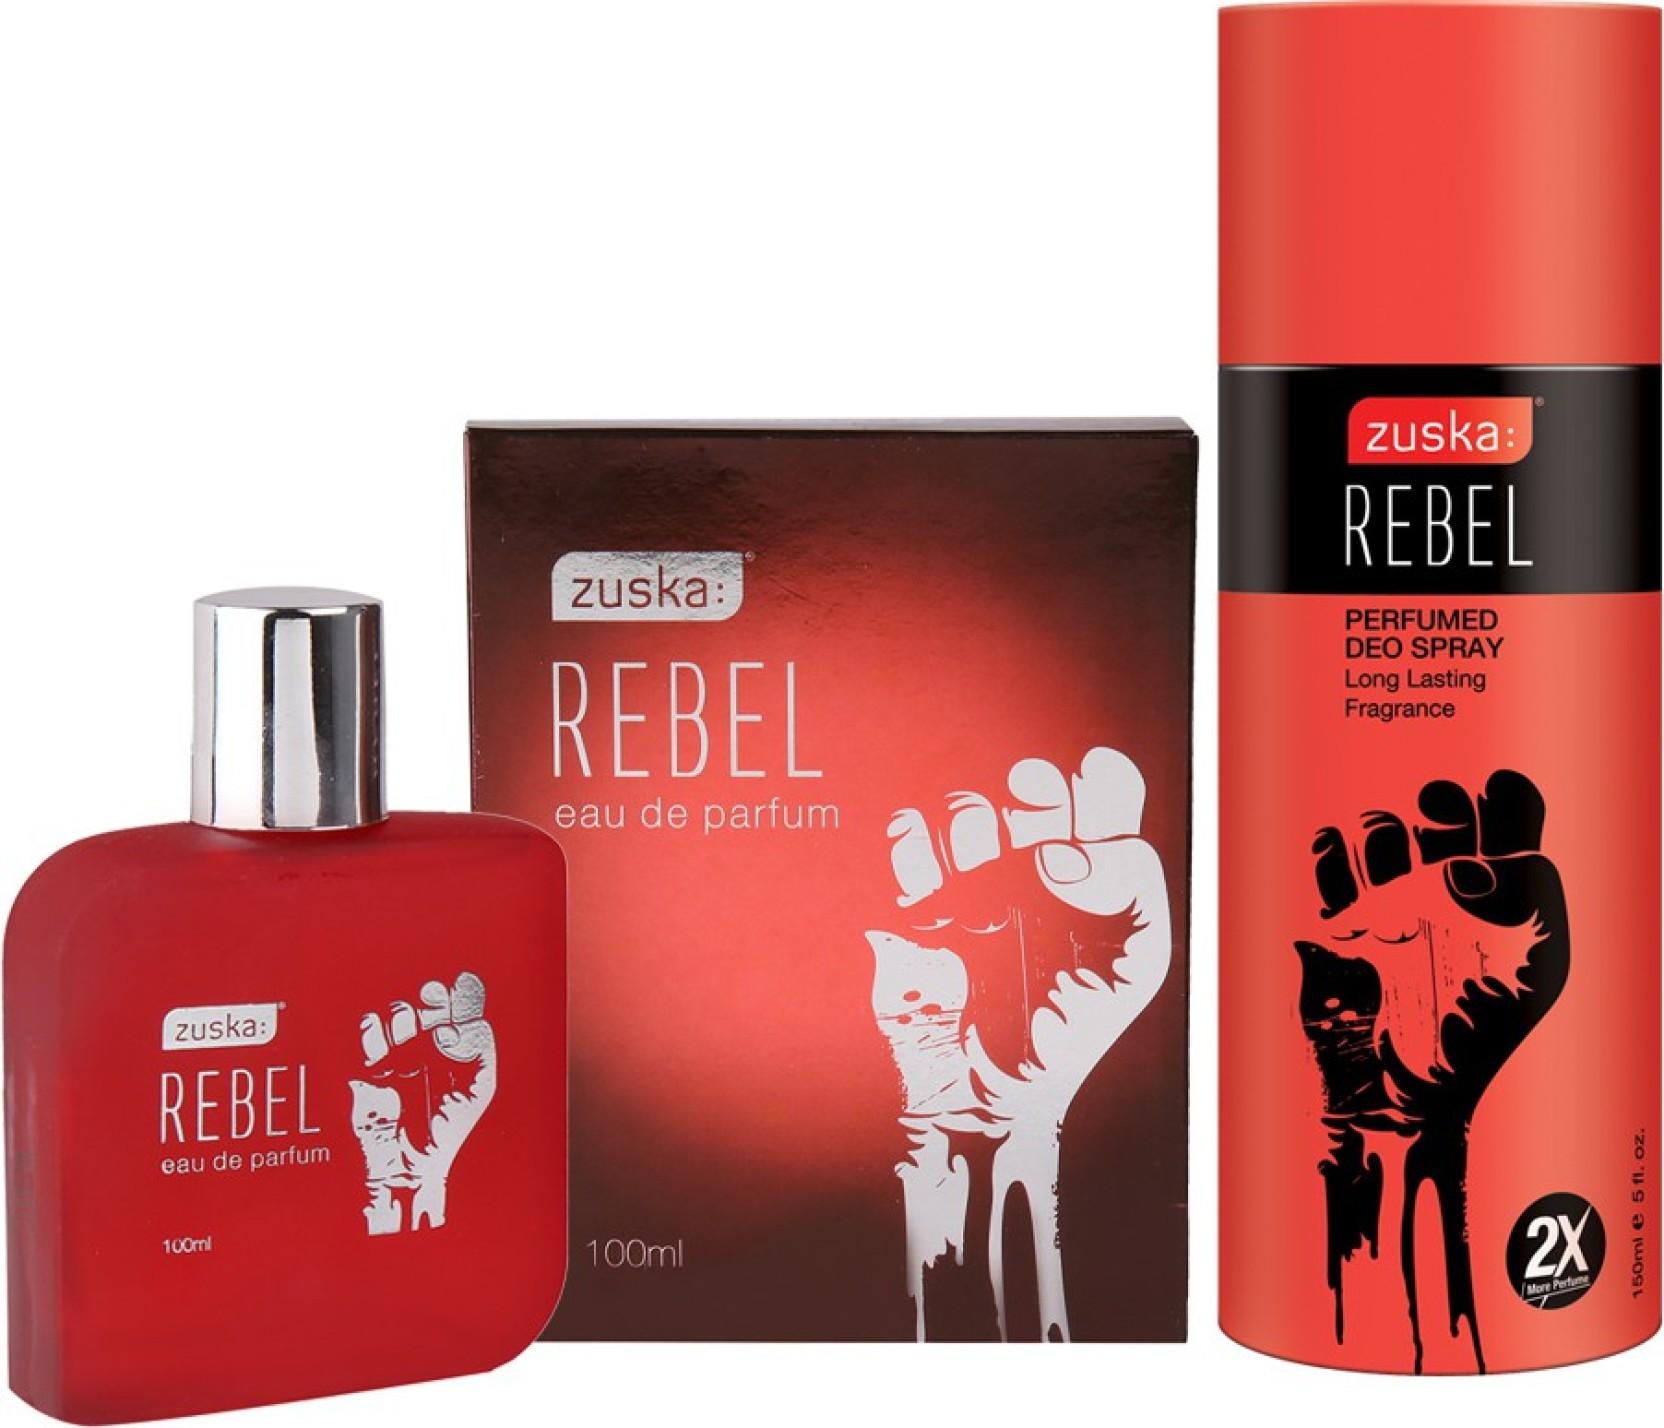 Buy Zuska Rebel Pack Perfume Deo Eau De Parfum 250 Original Adidas Get Ready Add To Cart